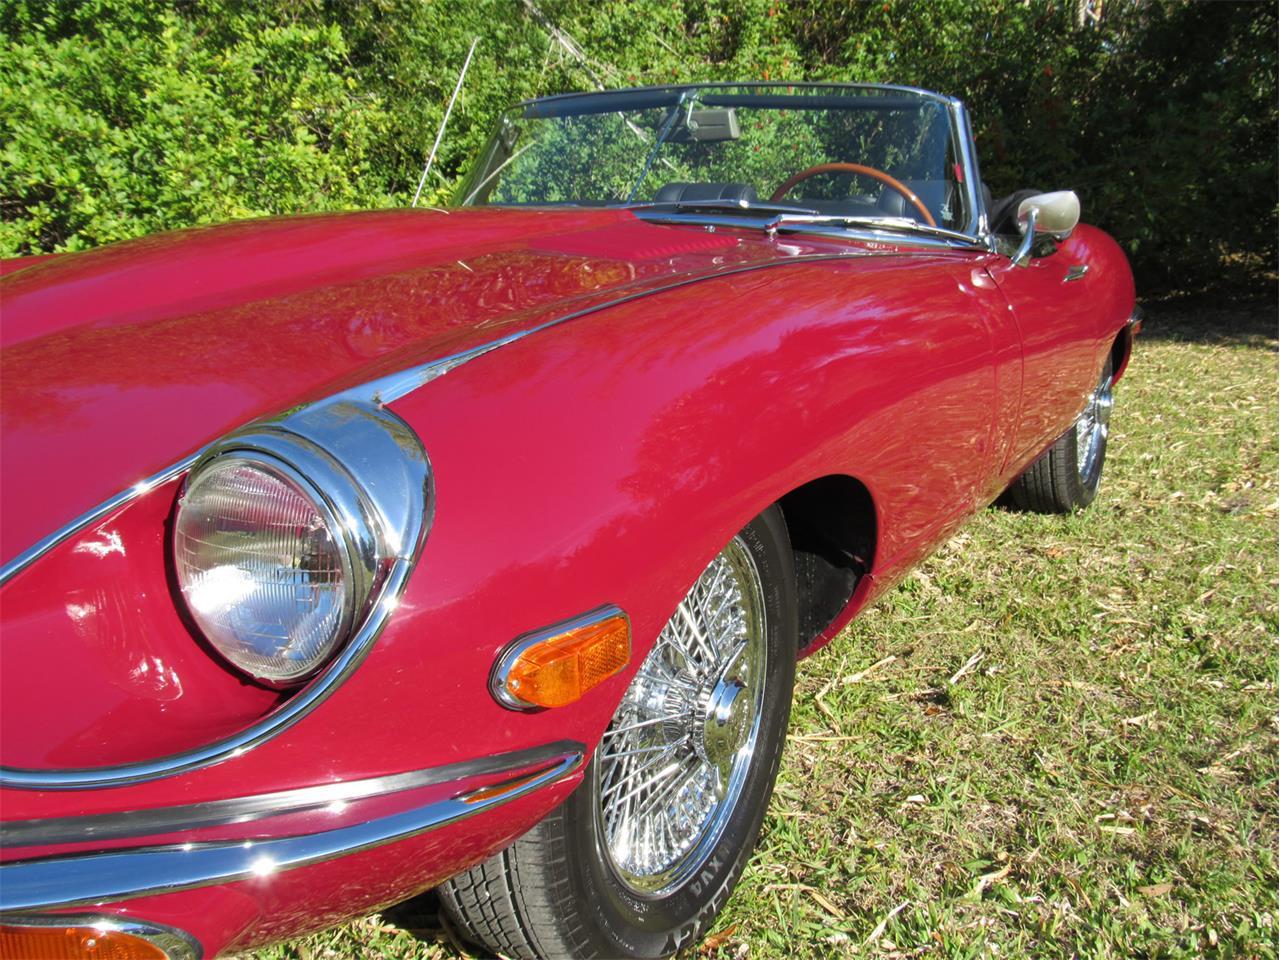 1969 Jaguar E-Type (CC-1087685) for sale in Sarasota, Florida